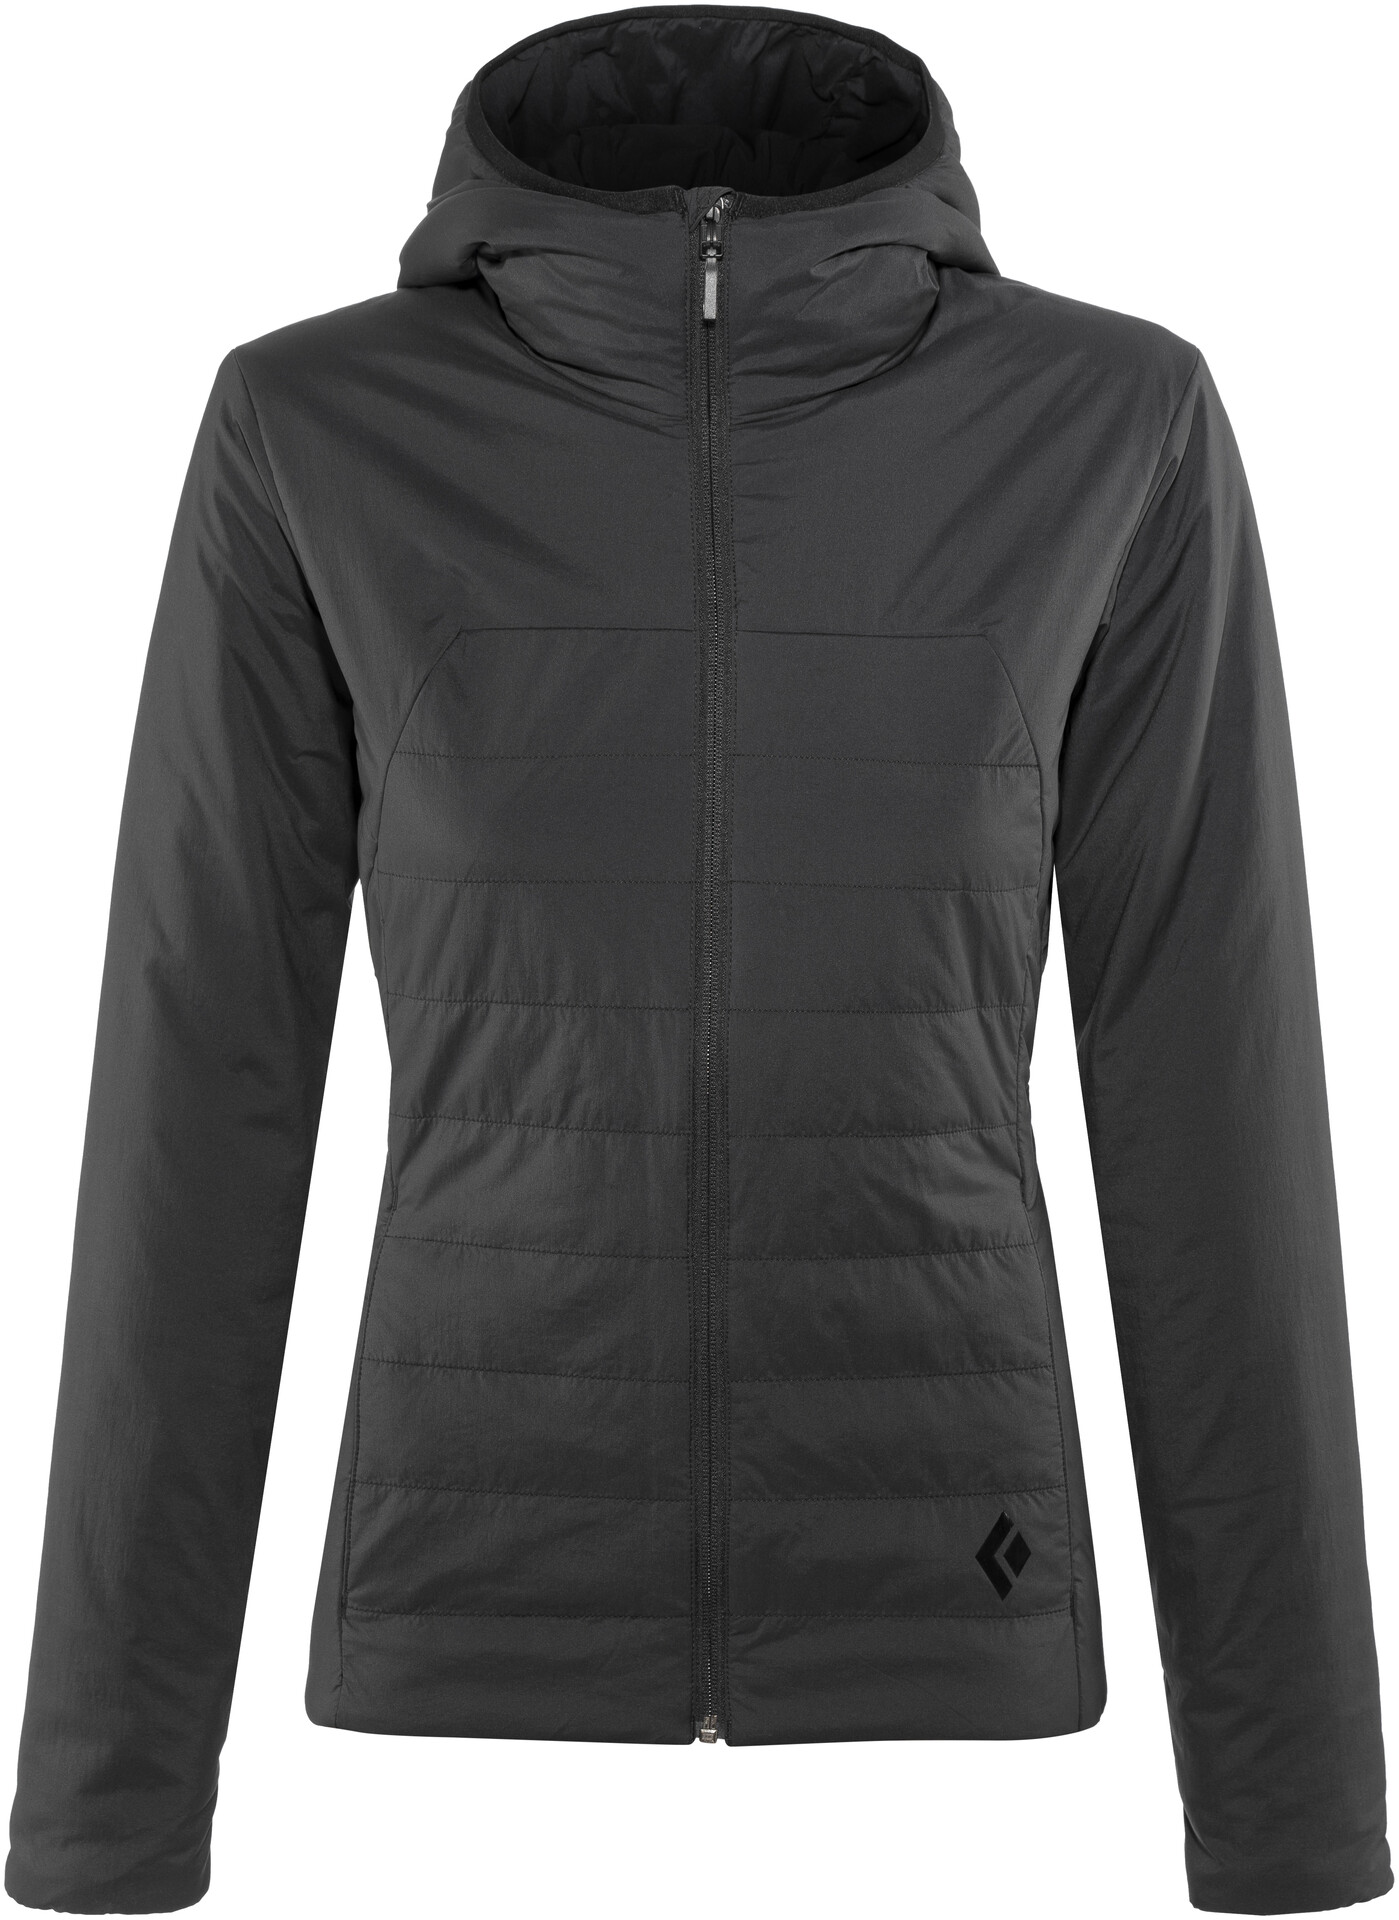 Black Diamond First Light Jacket Women grey at Addnaturecouk